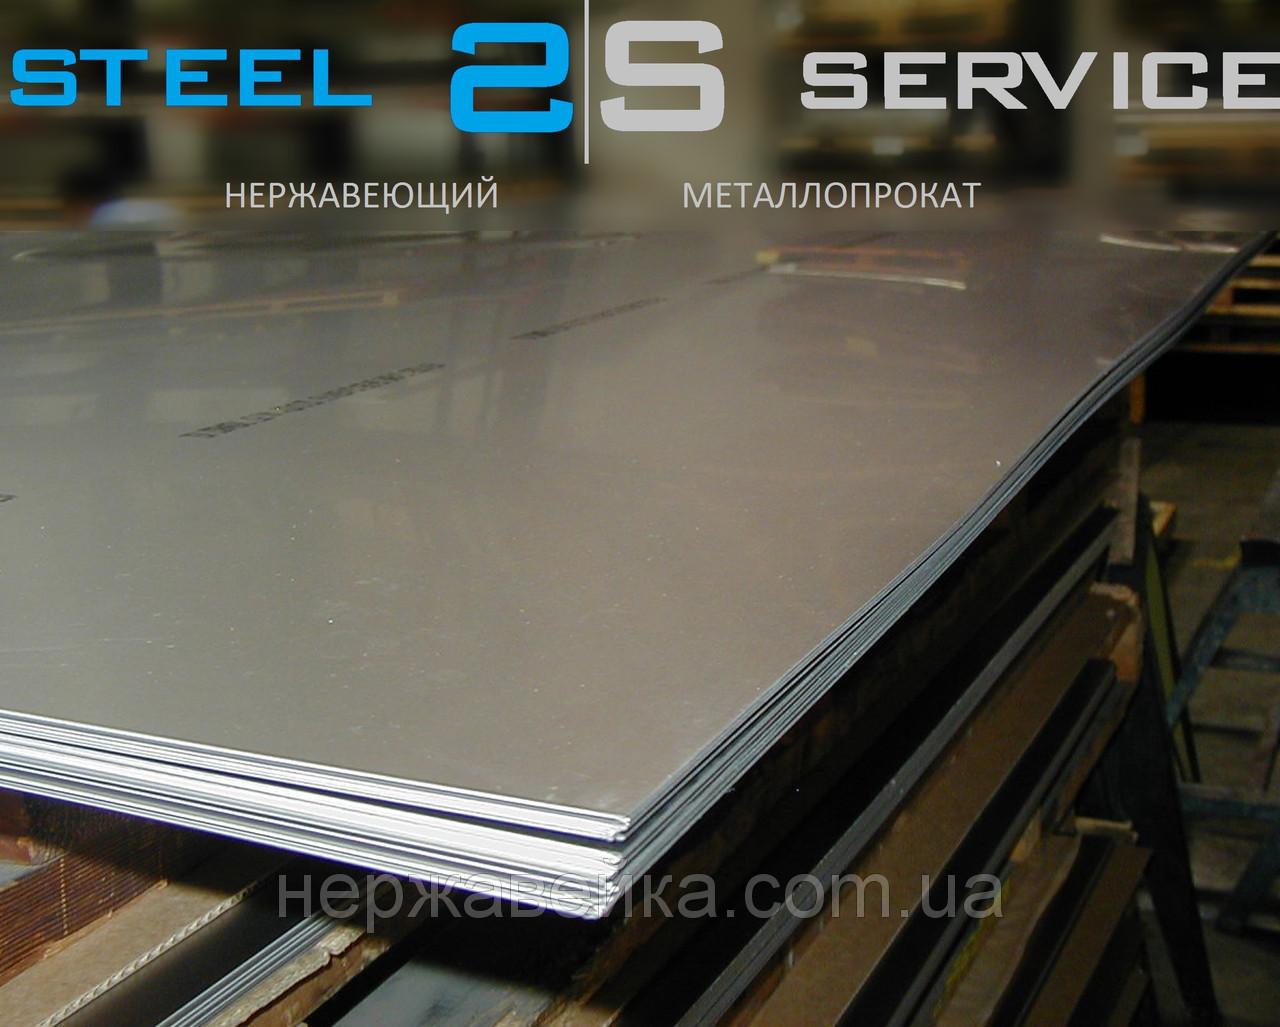 Нержавеющий лист 12х1500х6000мм AISI 430(12Х17) 2B - матовый, технический